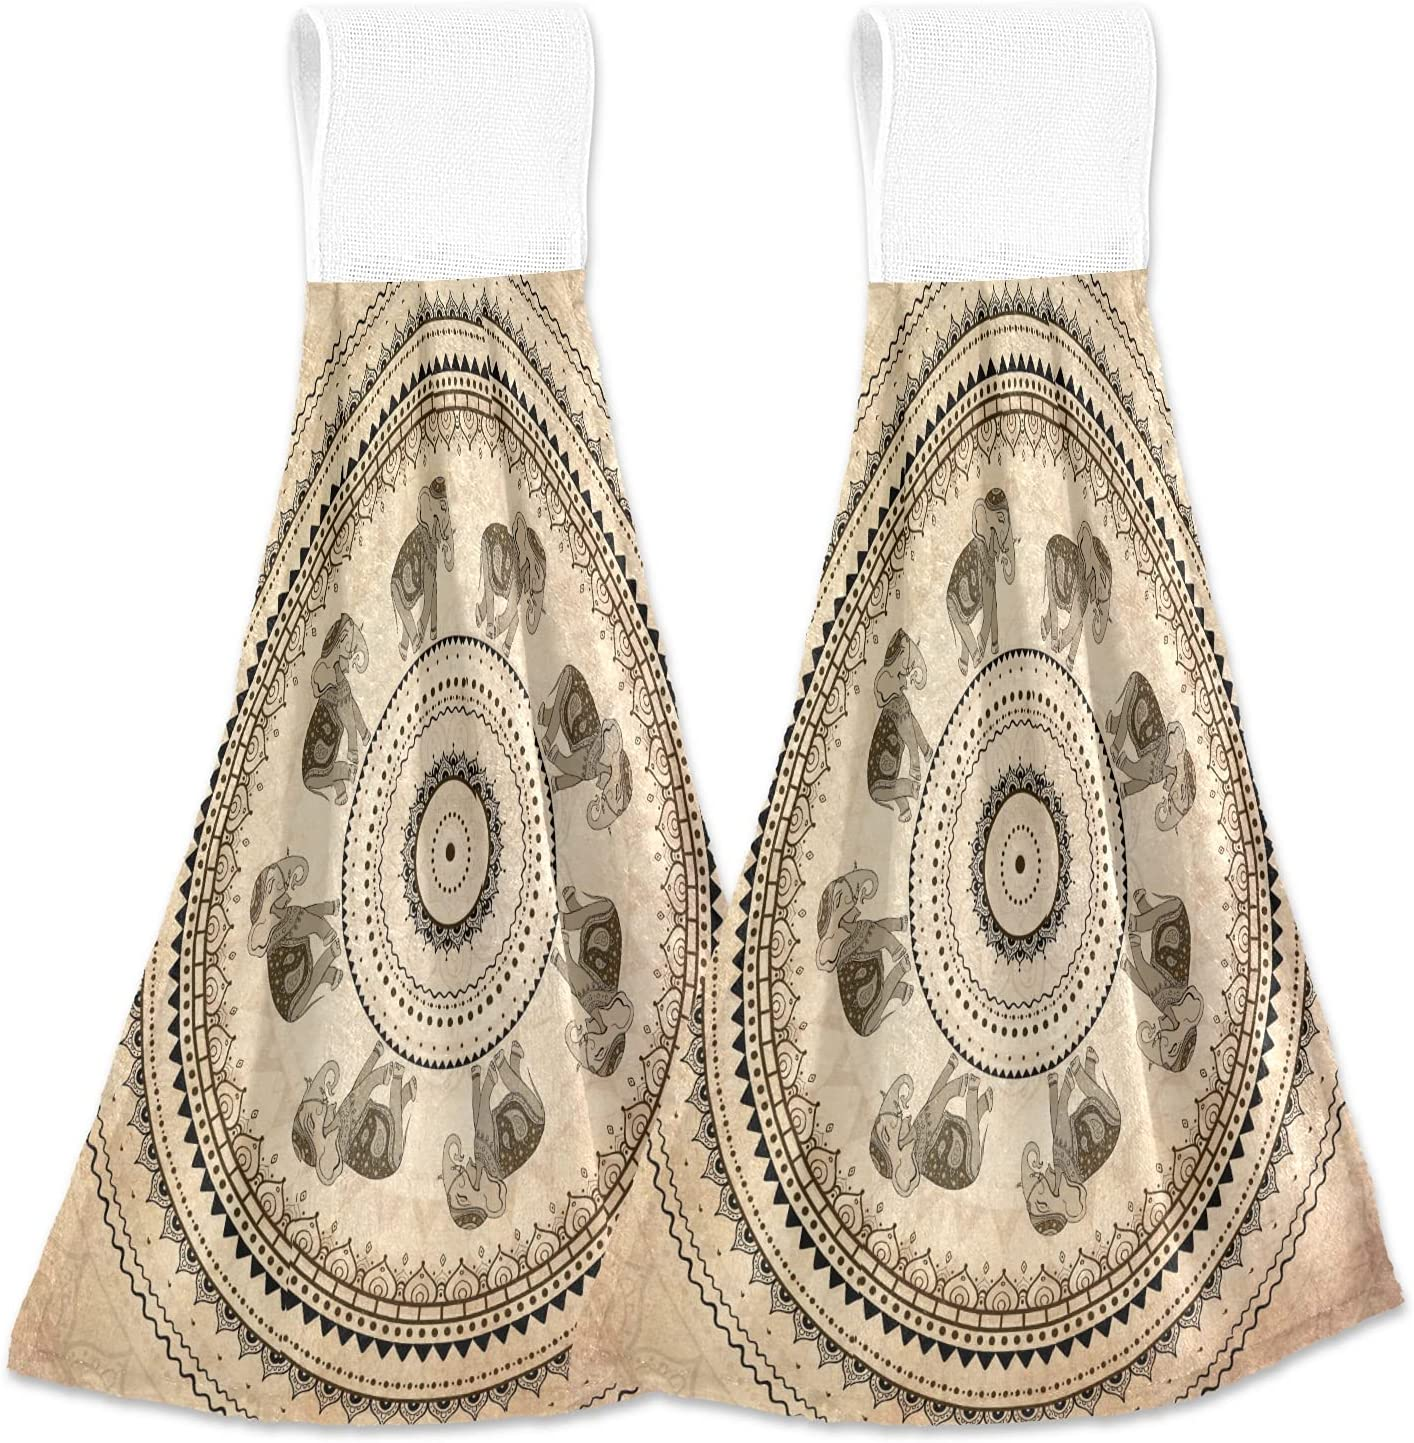 Oarencol Vintage Mandala Elephant Flower 35% OFF Towel Max 53% OFF Kitchen Boho Hand